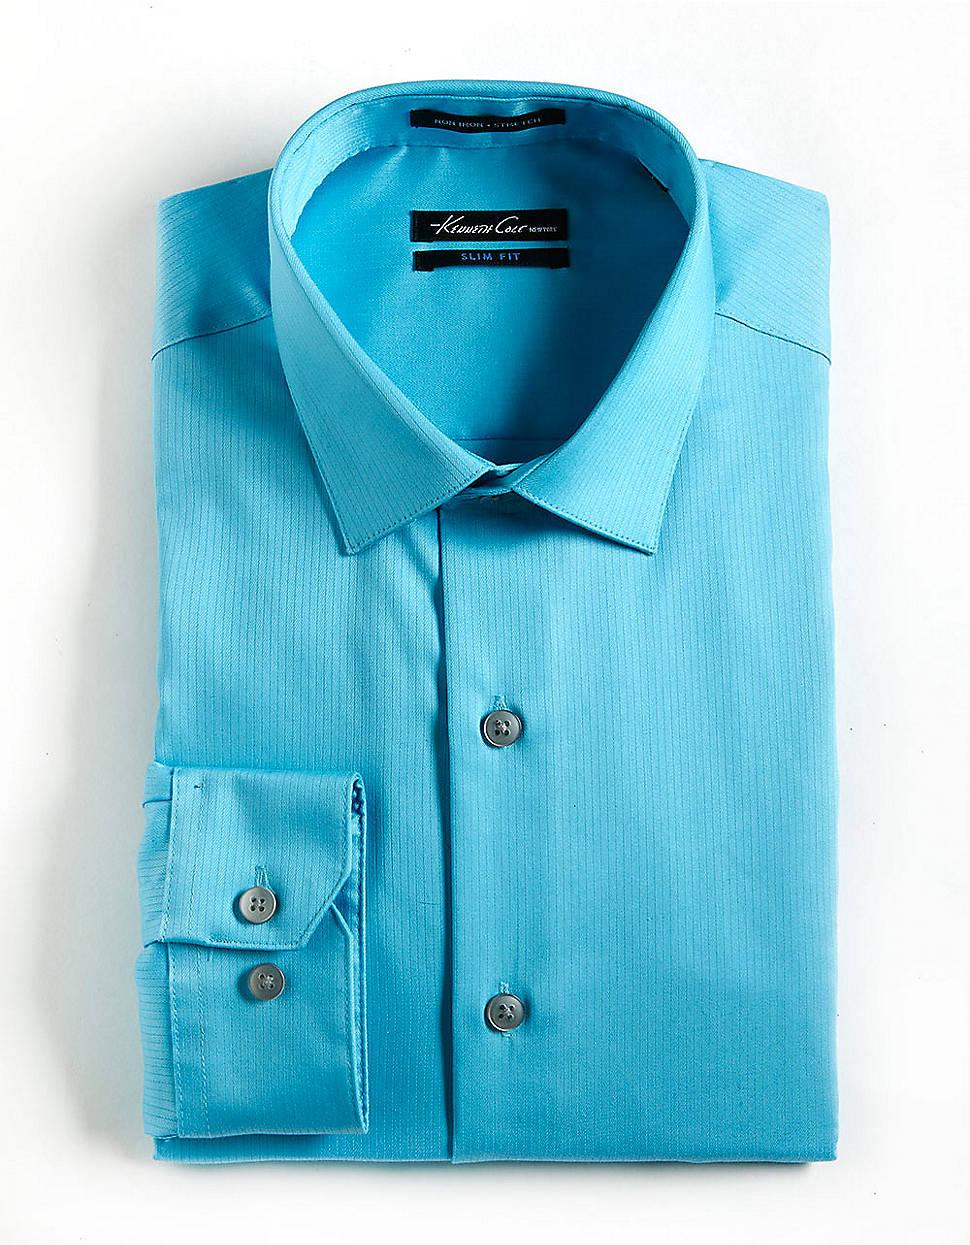 Look - Dress Cole shirts video